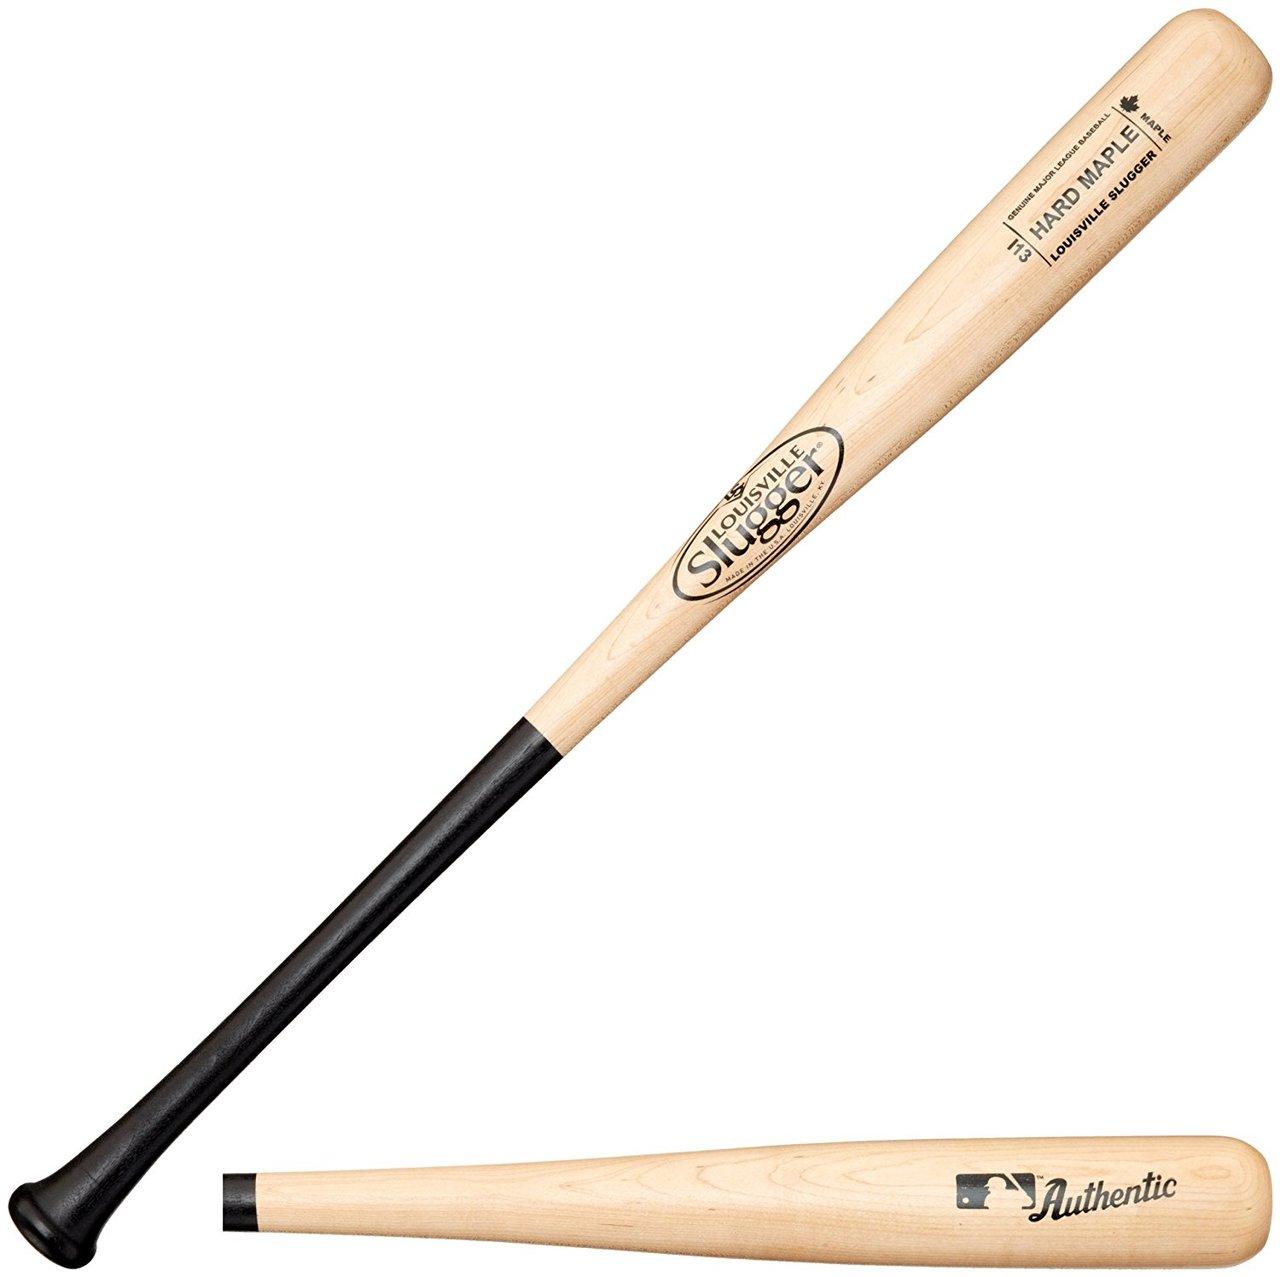 louisville-slugger-i13-hard-maple-wood-baseball-bat-33-inch WBHM14-13CBN33 Louisville 044277004170 Louisville Slugger Hard Maple Wood Baseball Bat Turning model I13 is